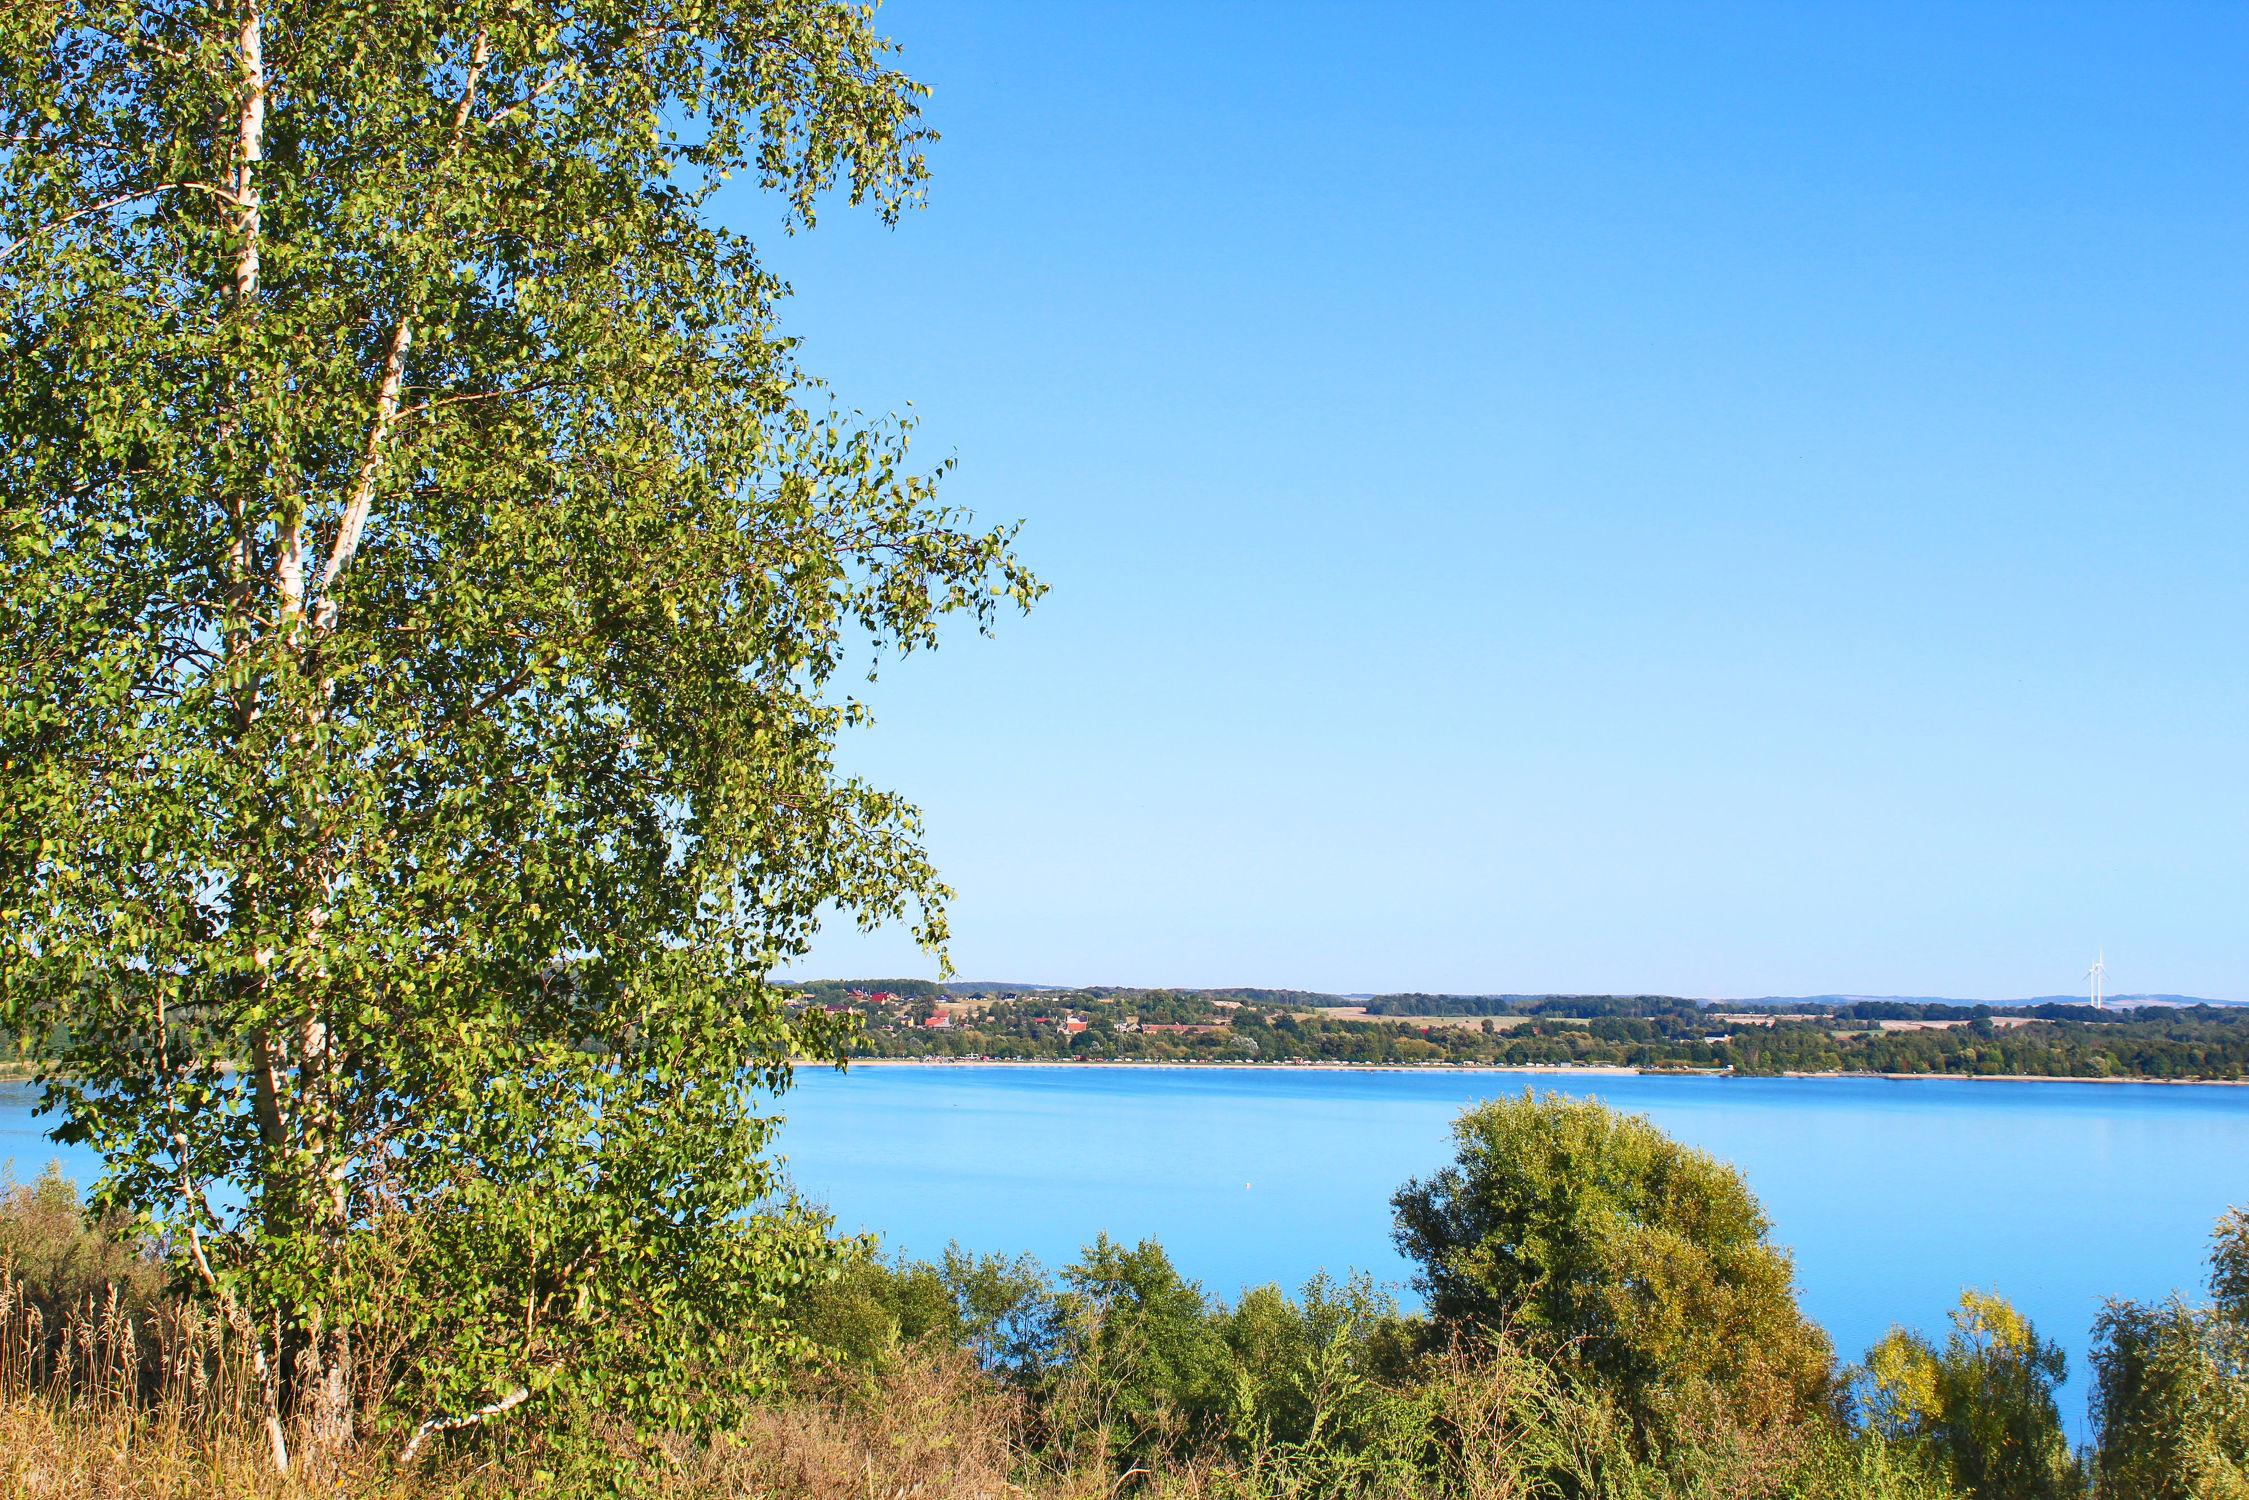 Bild mit Gewässer, Birke, Landschaft, Seeblick, Blauer Himmel, See, Berzdorfer See, landscape, Blick über den See